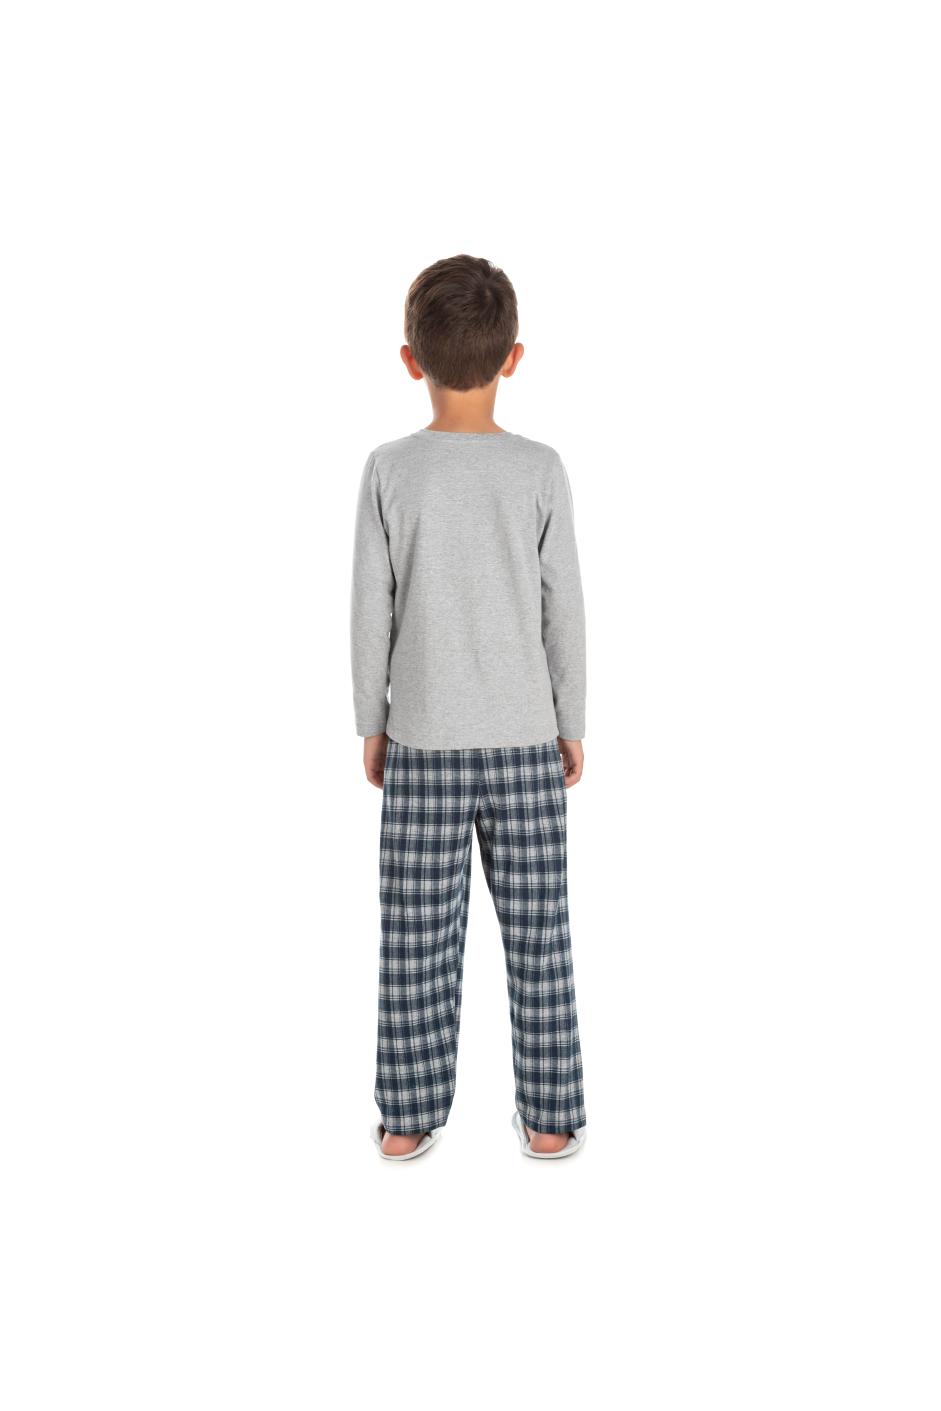 190/F - Pijama Infantil Masculino Xadrez Família Completa